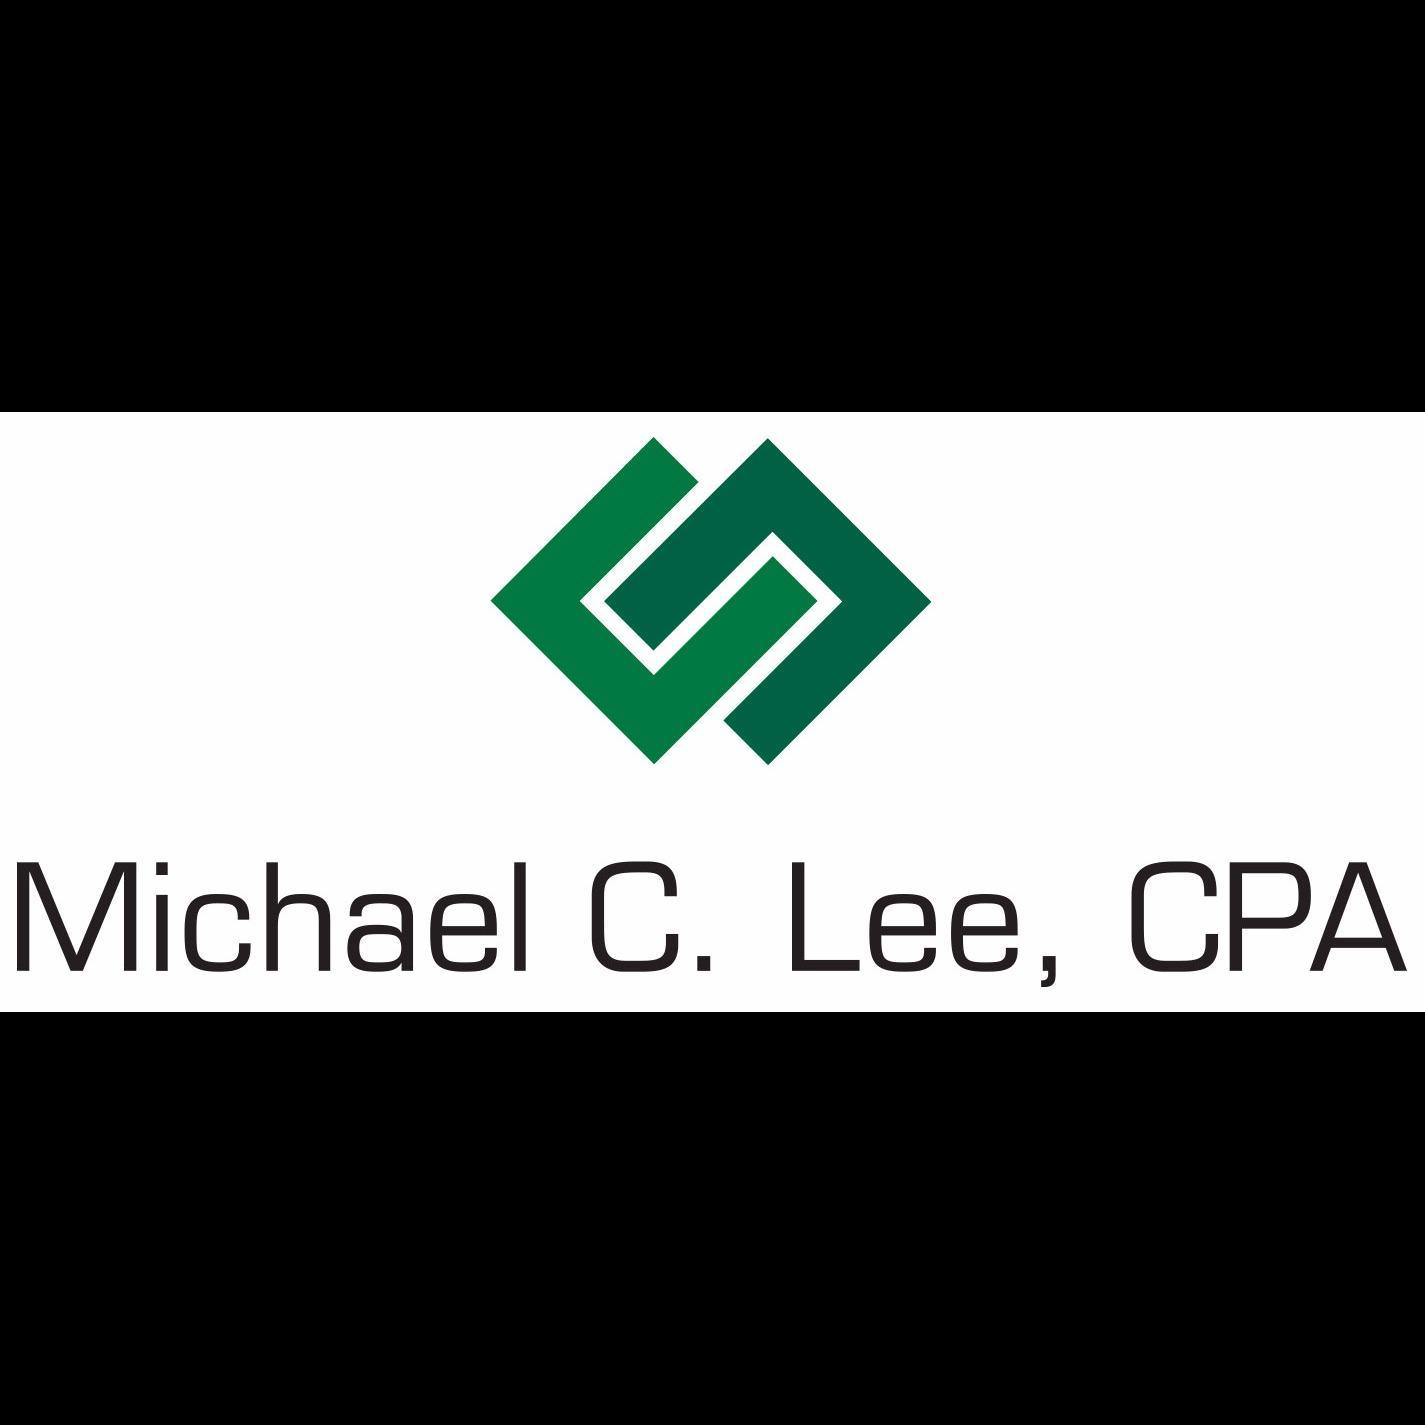 Michael C Lee, CPA